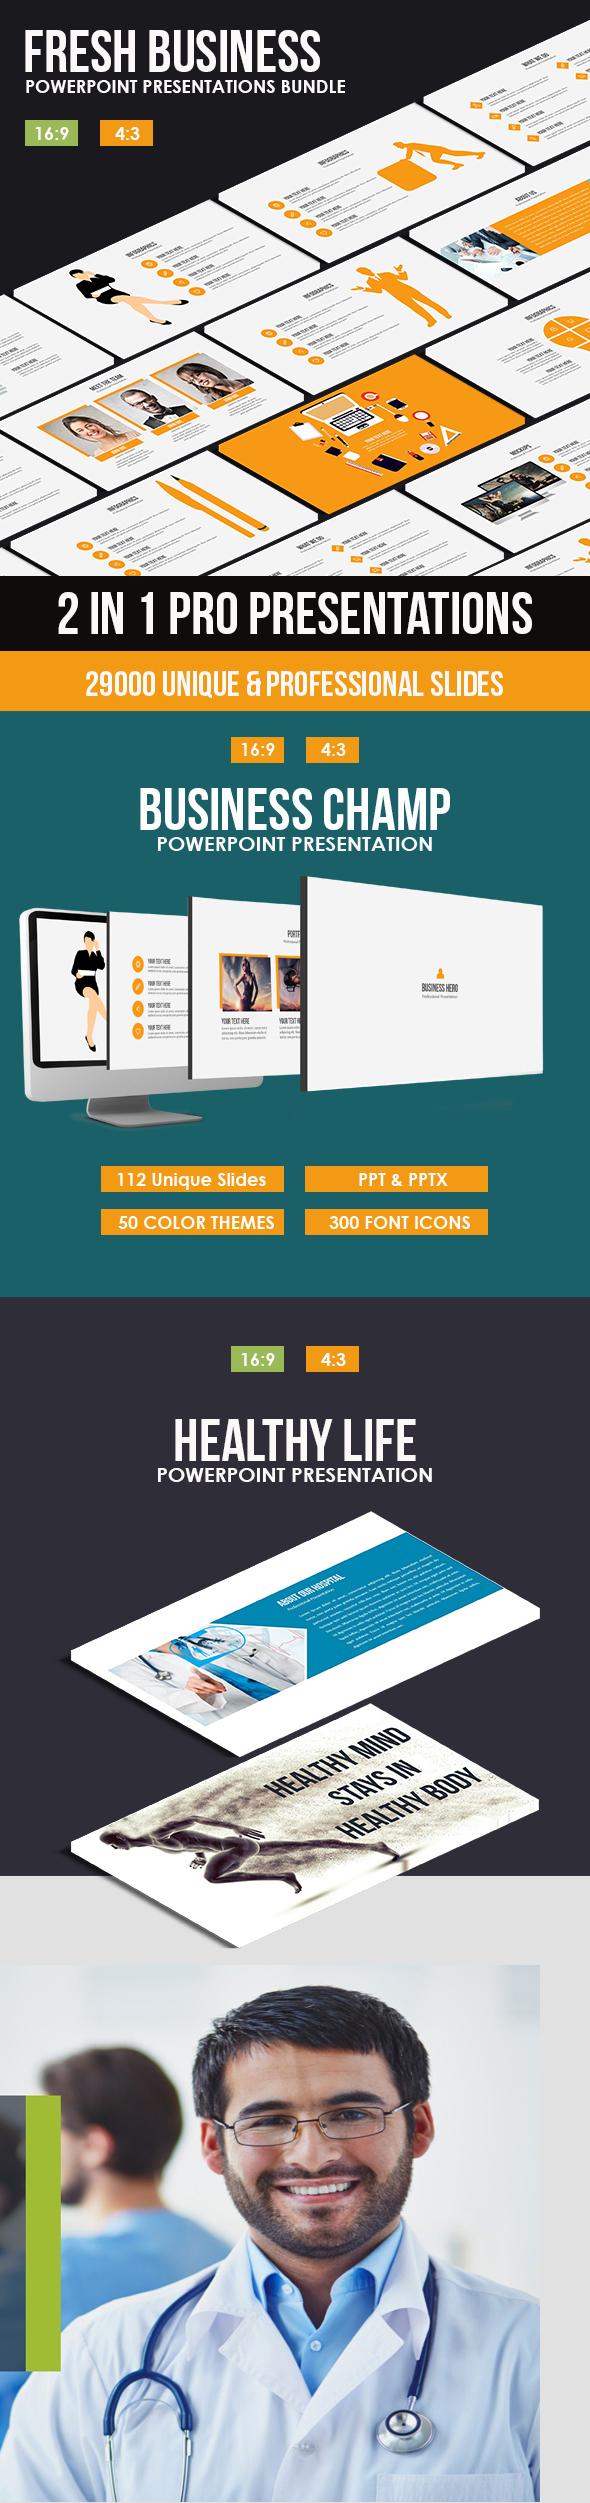 Fresh Business Powerpoint Bundle